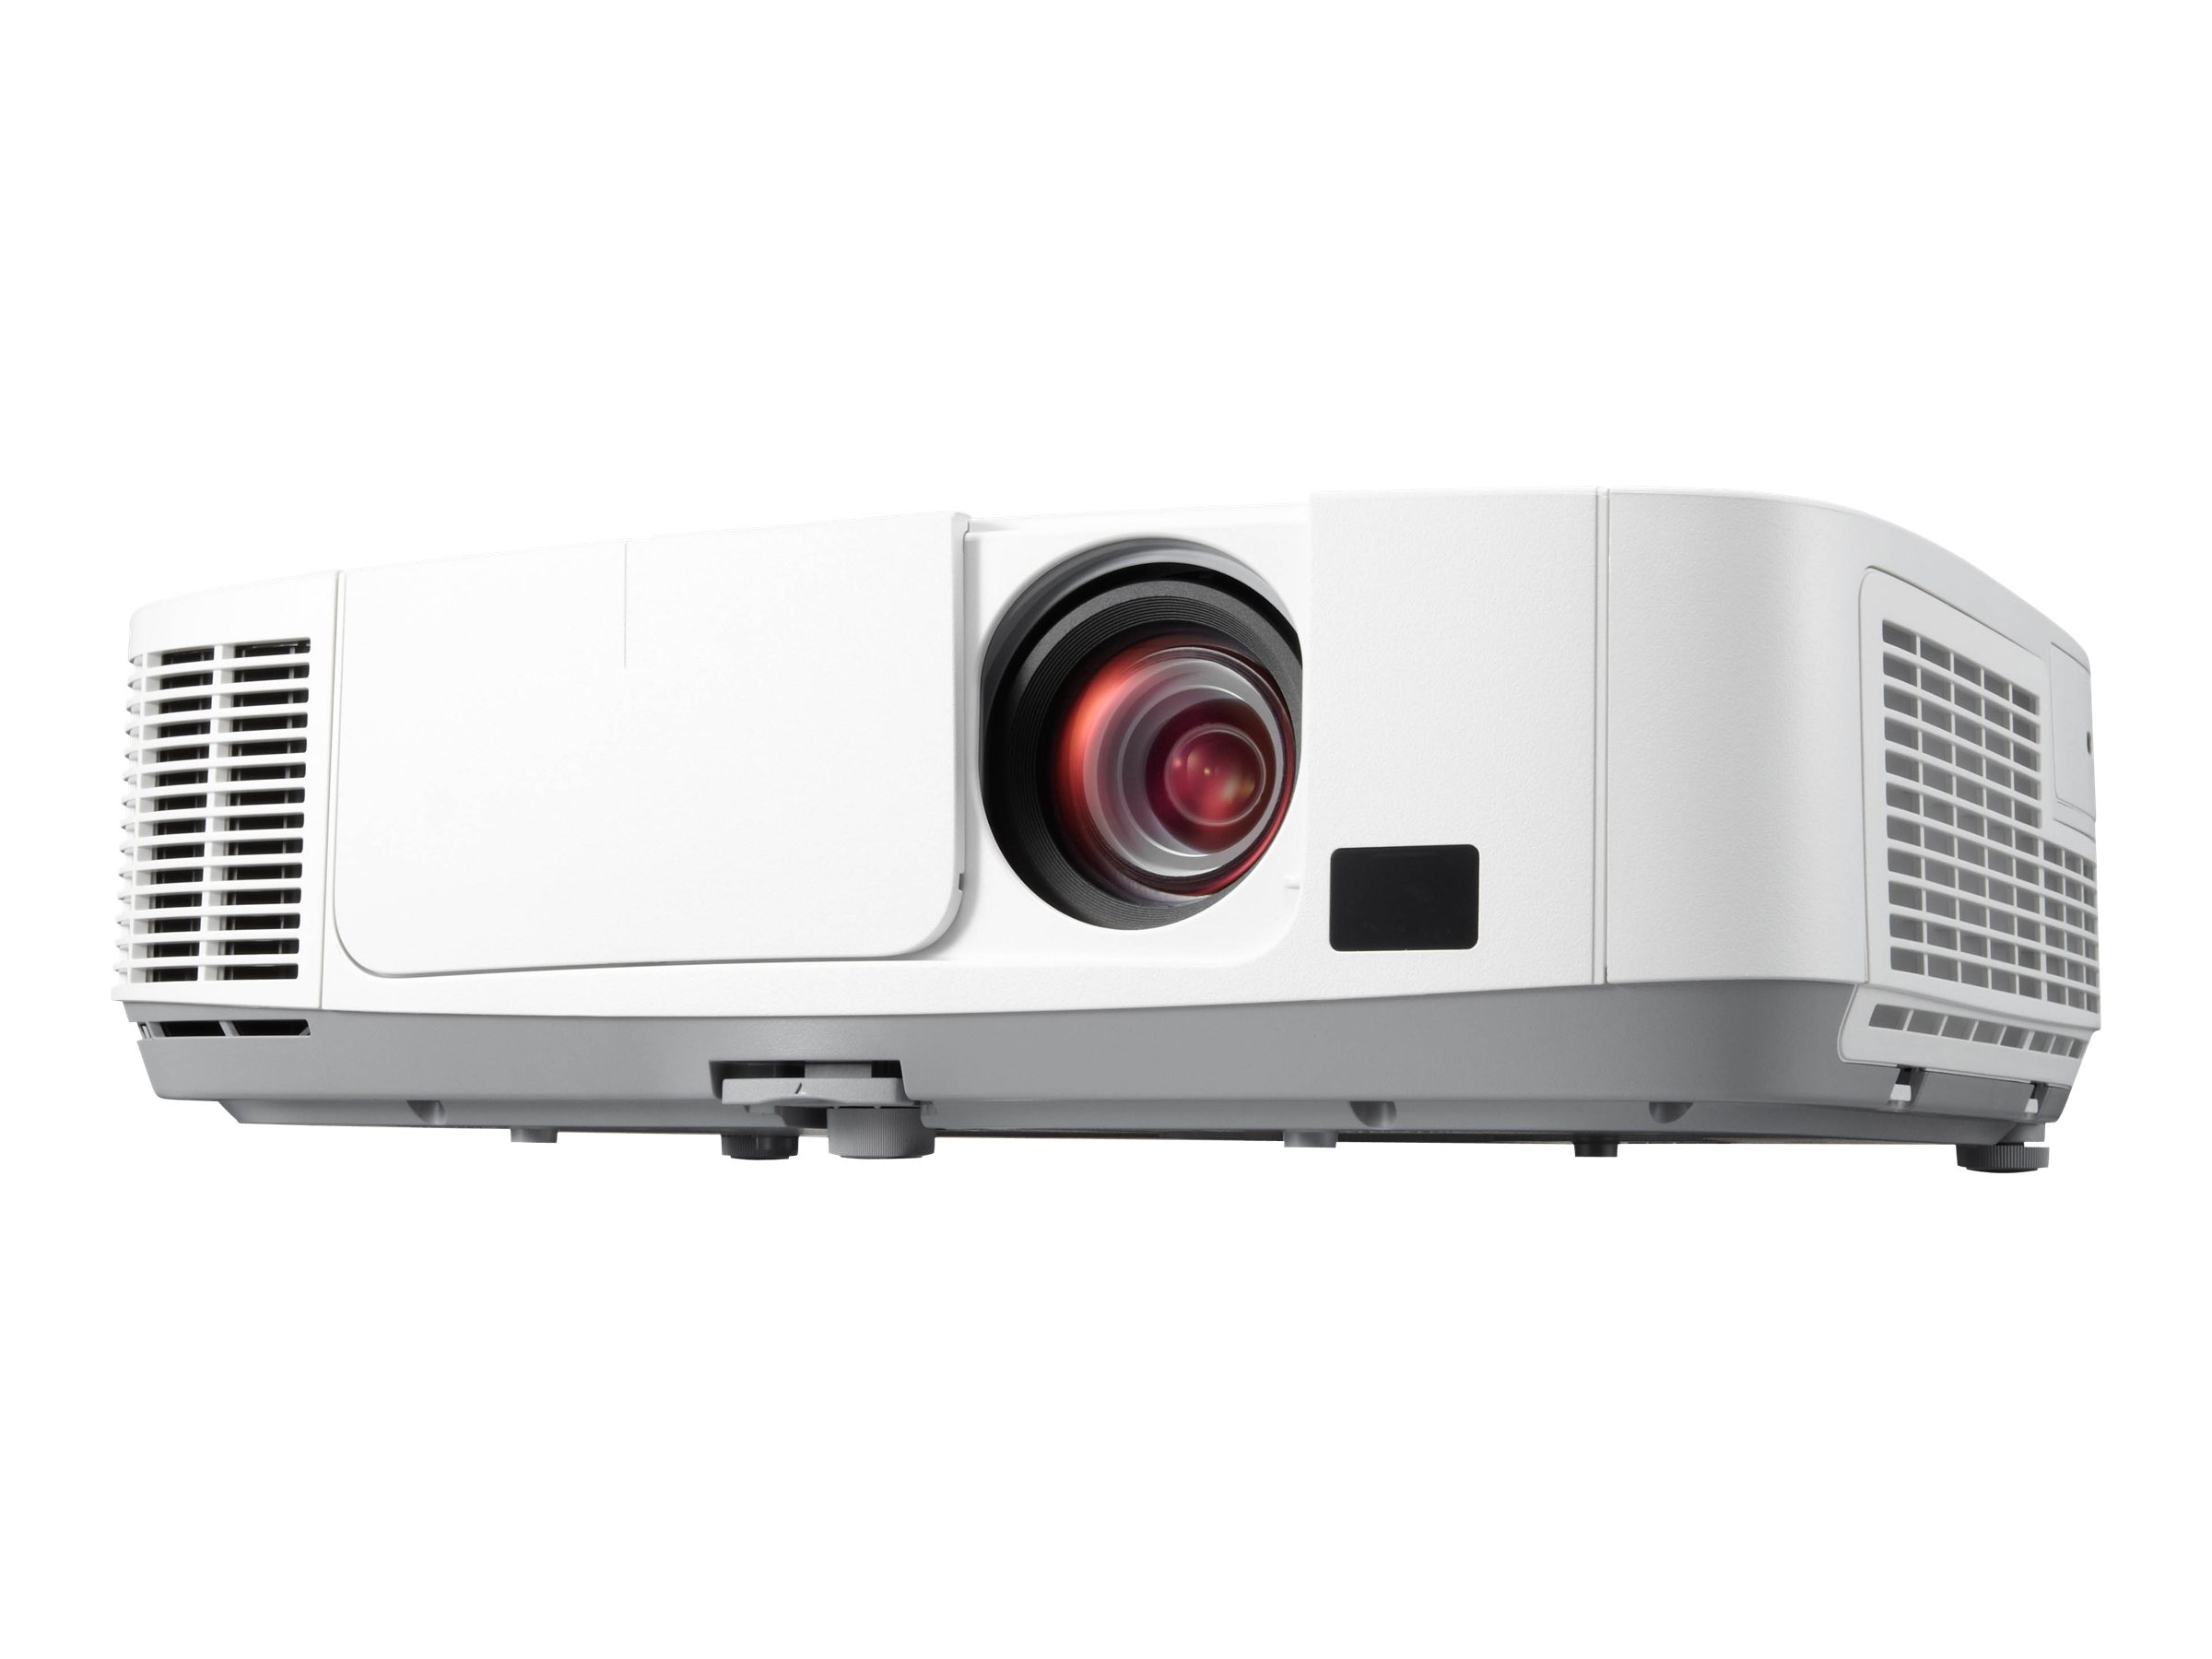 NEC NP-P501X XGA LCD Projector, 5000 Lumens, White